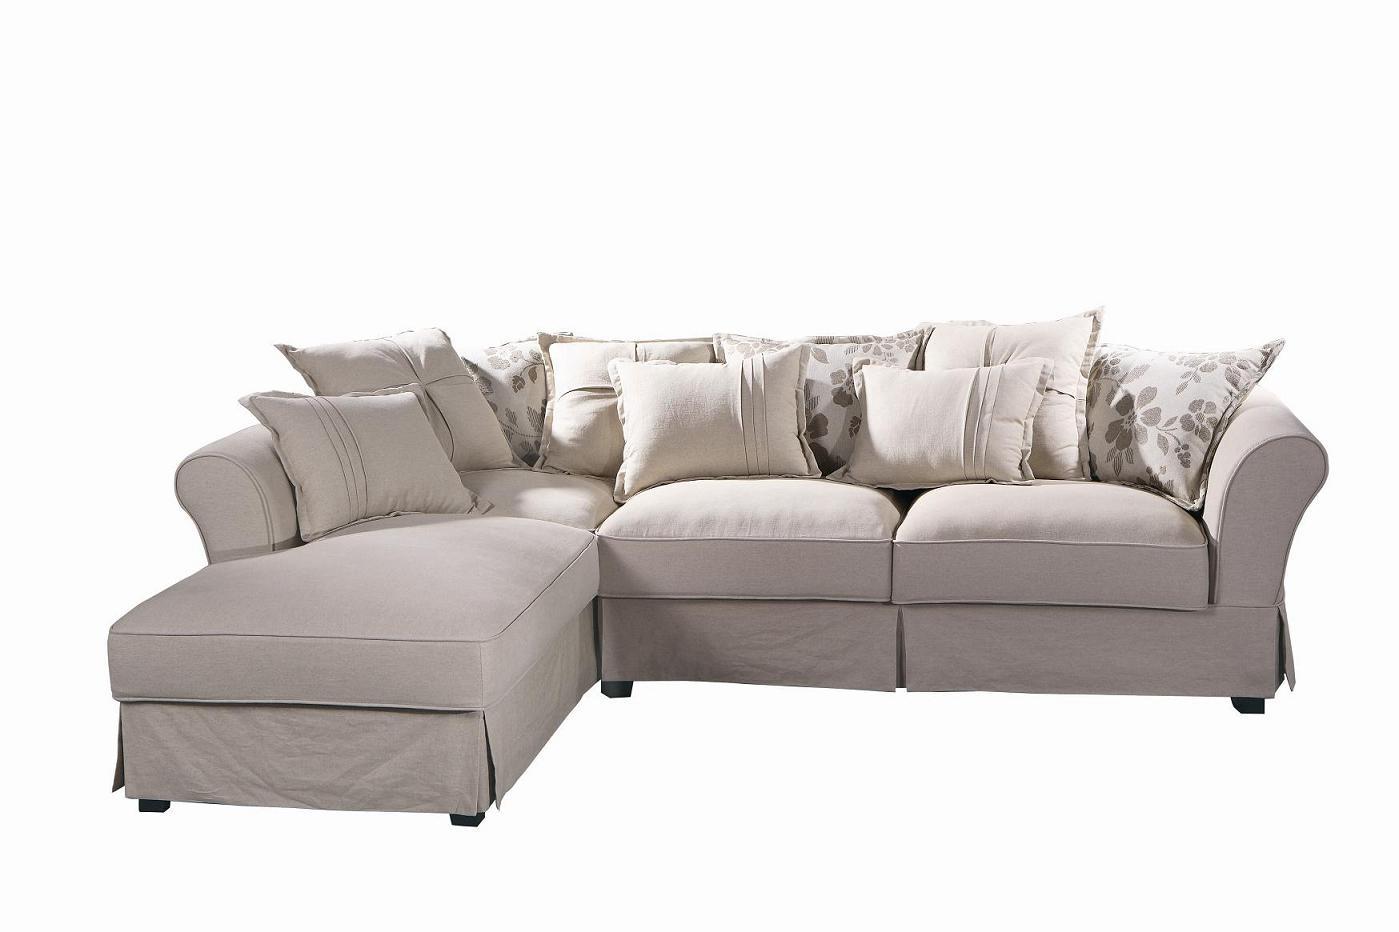 Uncategorized: Inspirations Affordable Sectionals Sectional Couch With Affordable Sectional Sofas (Photo 4 of 10)